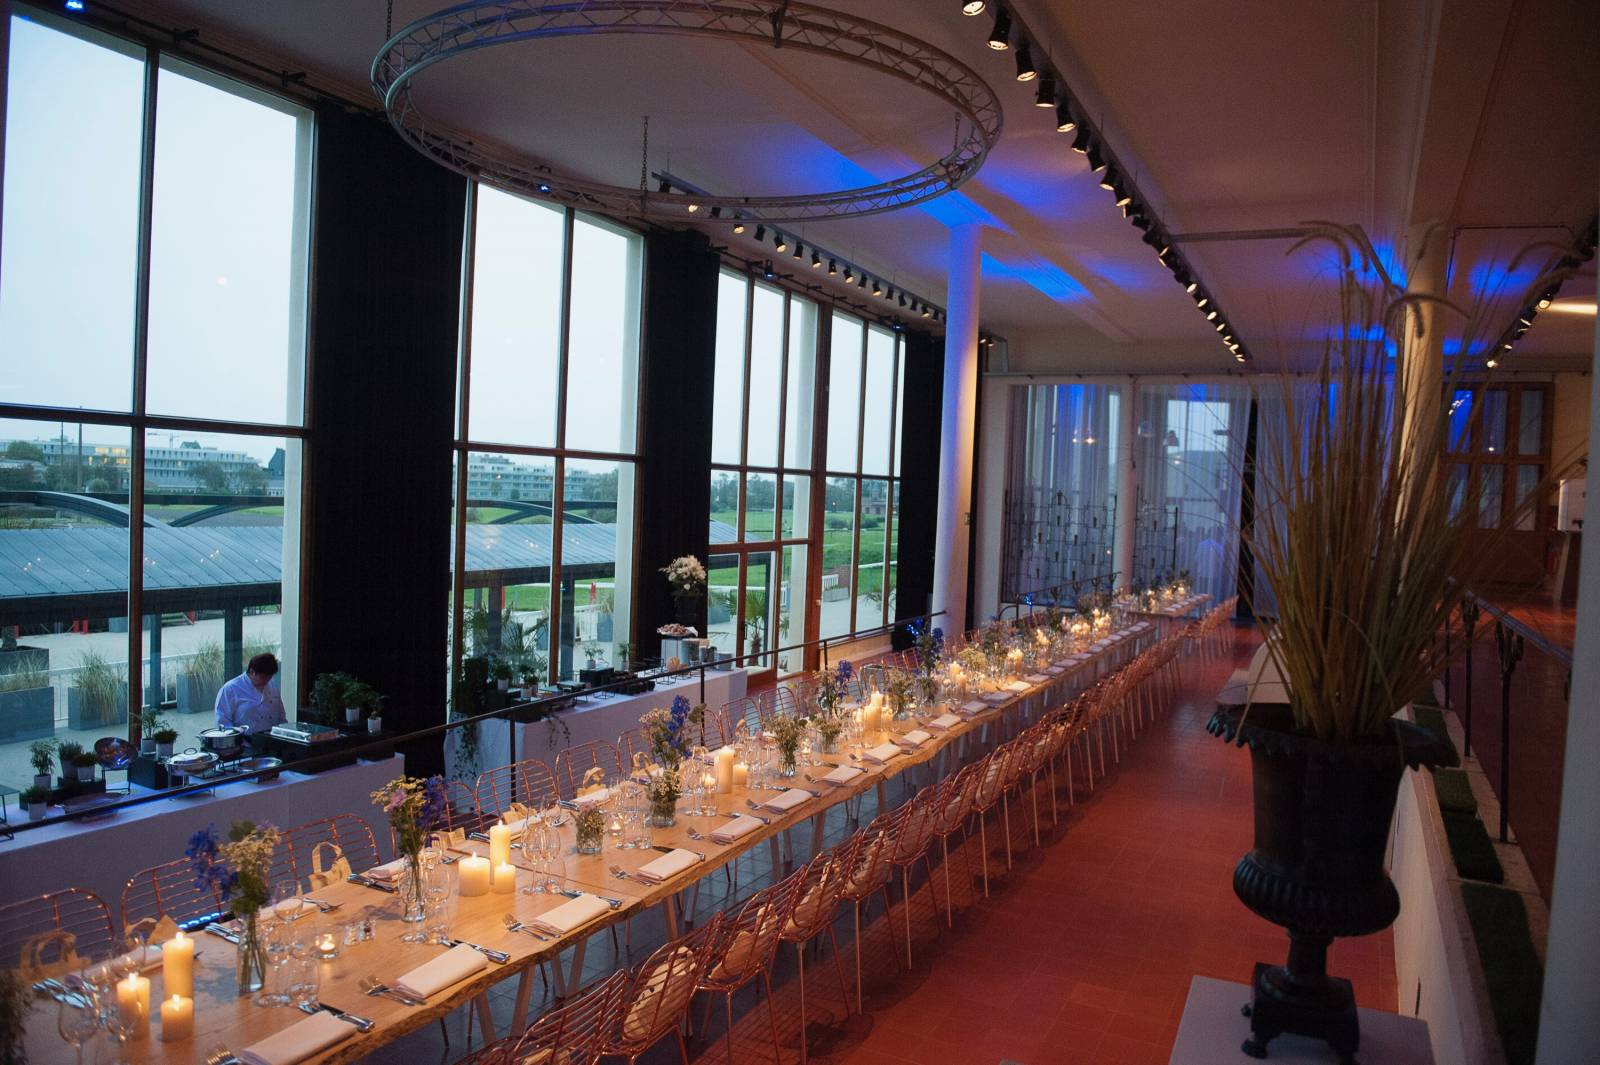 Ostend Sea P'lace - Bagatelle - Feestlocatie Oostende - House of Weddings - 6